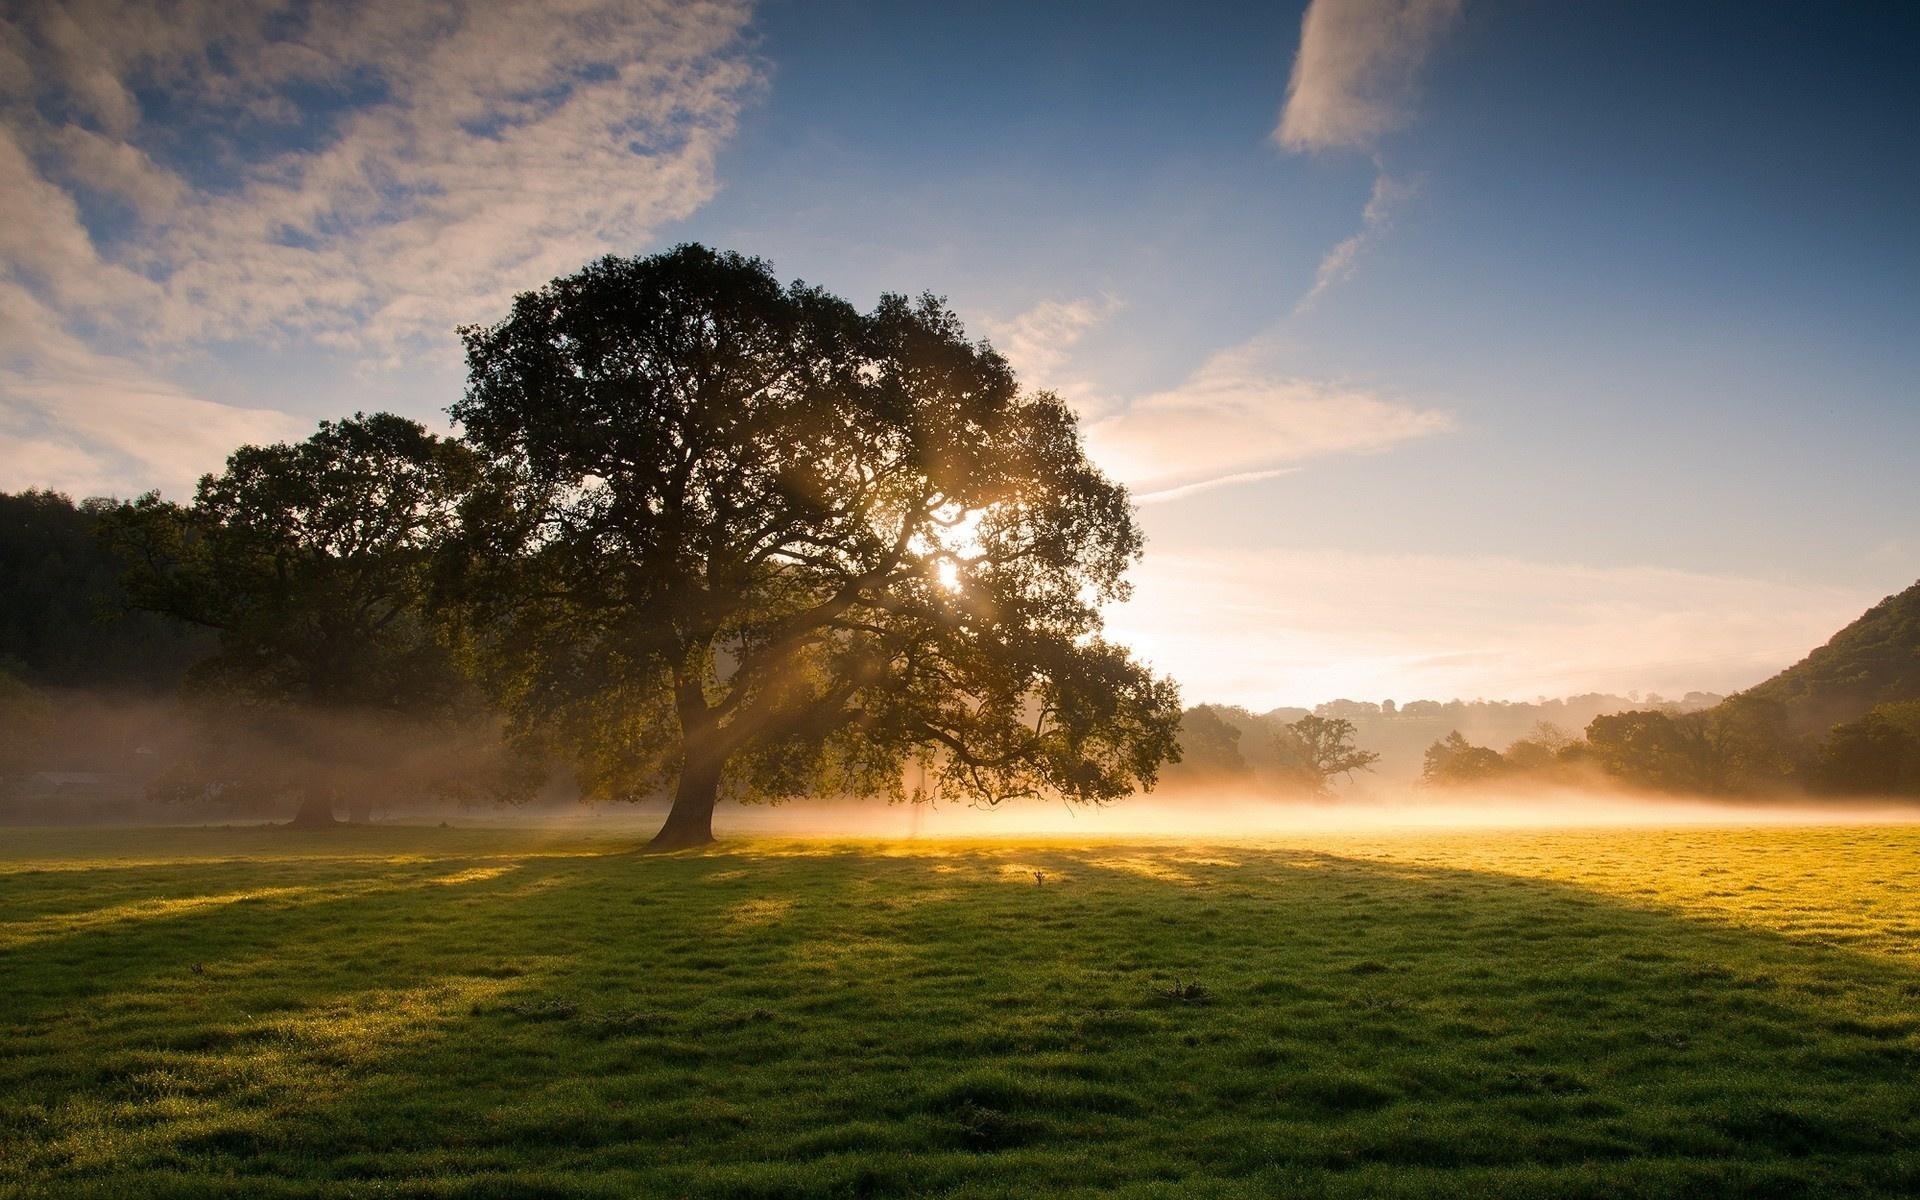 Картинки восход солнца в лесу, днем рождения мужчине